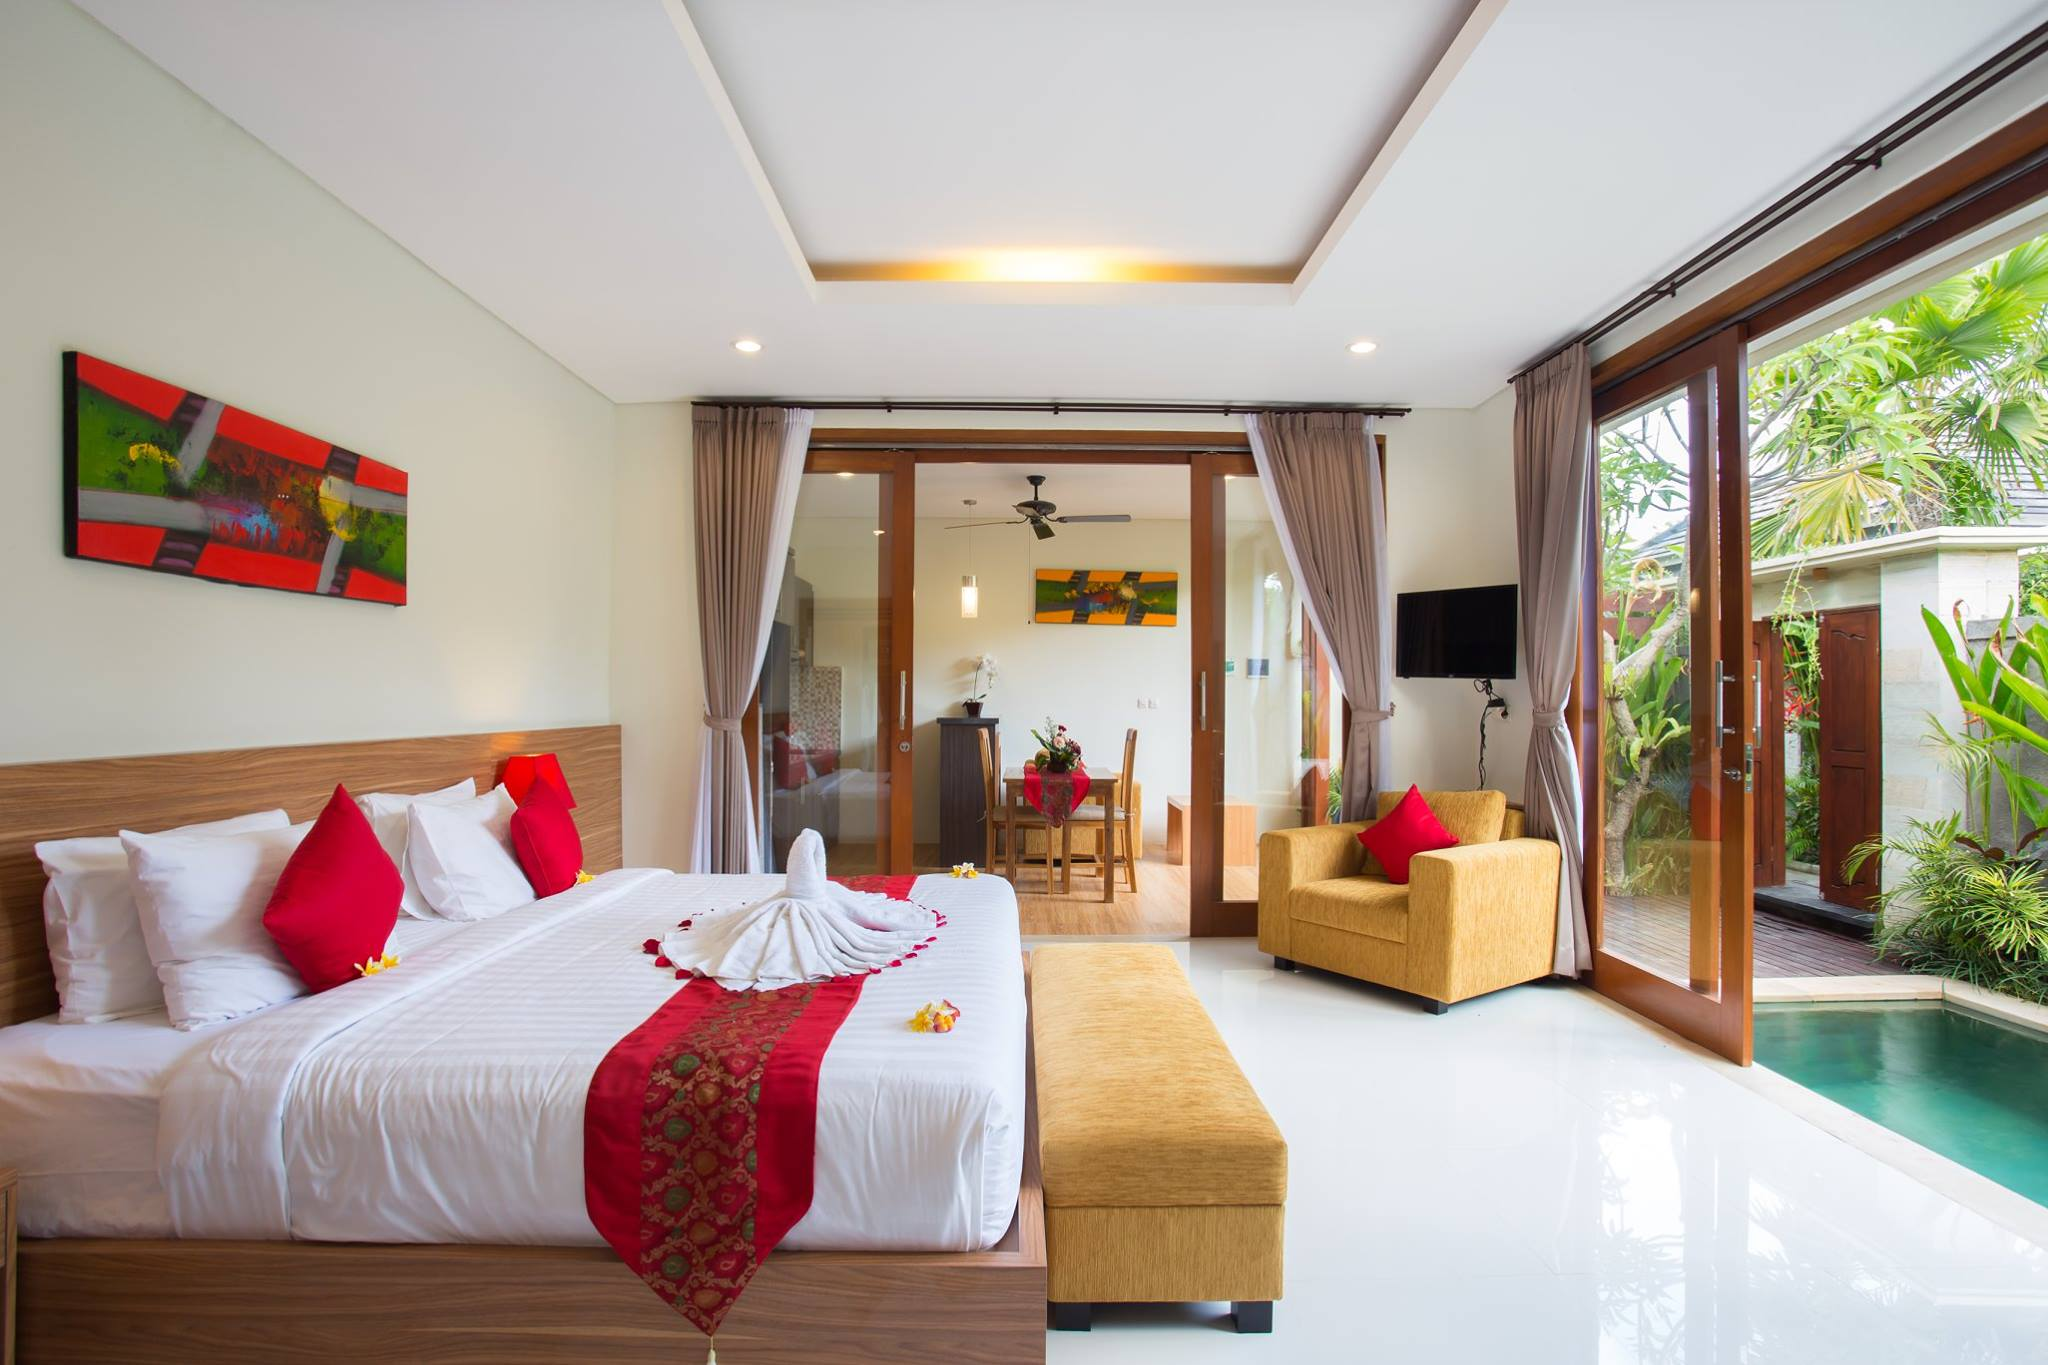 Image from Aishwarya Exclusive Villas